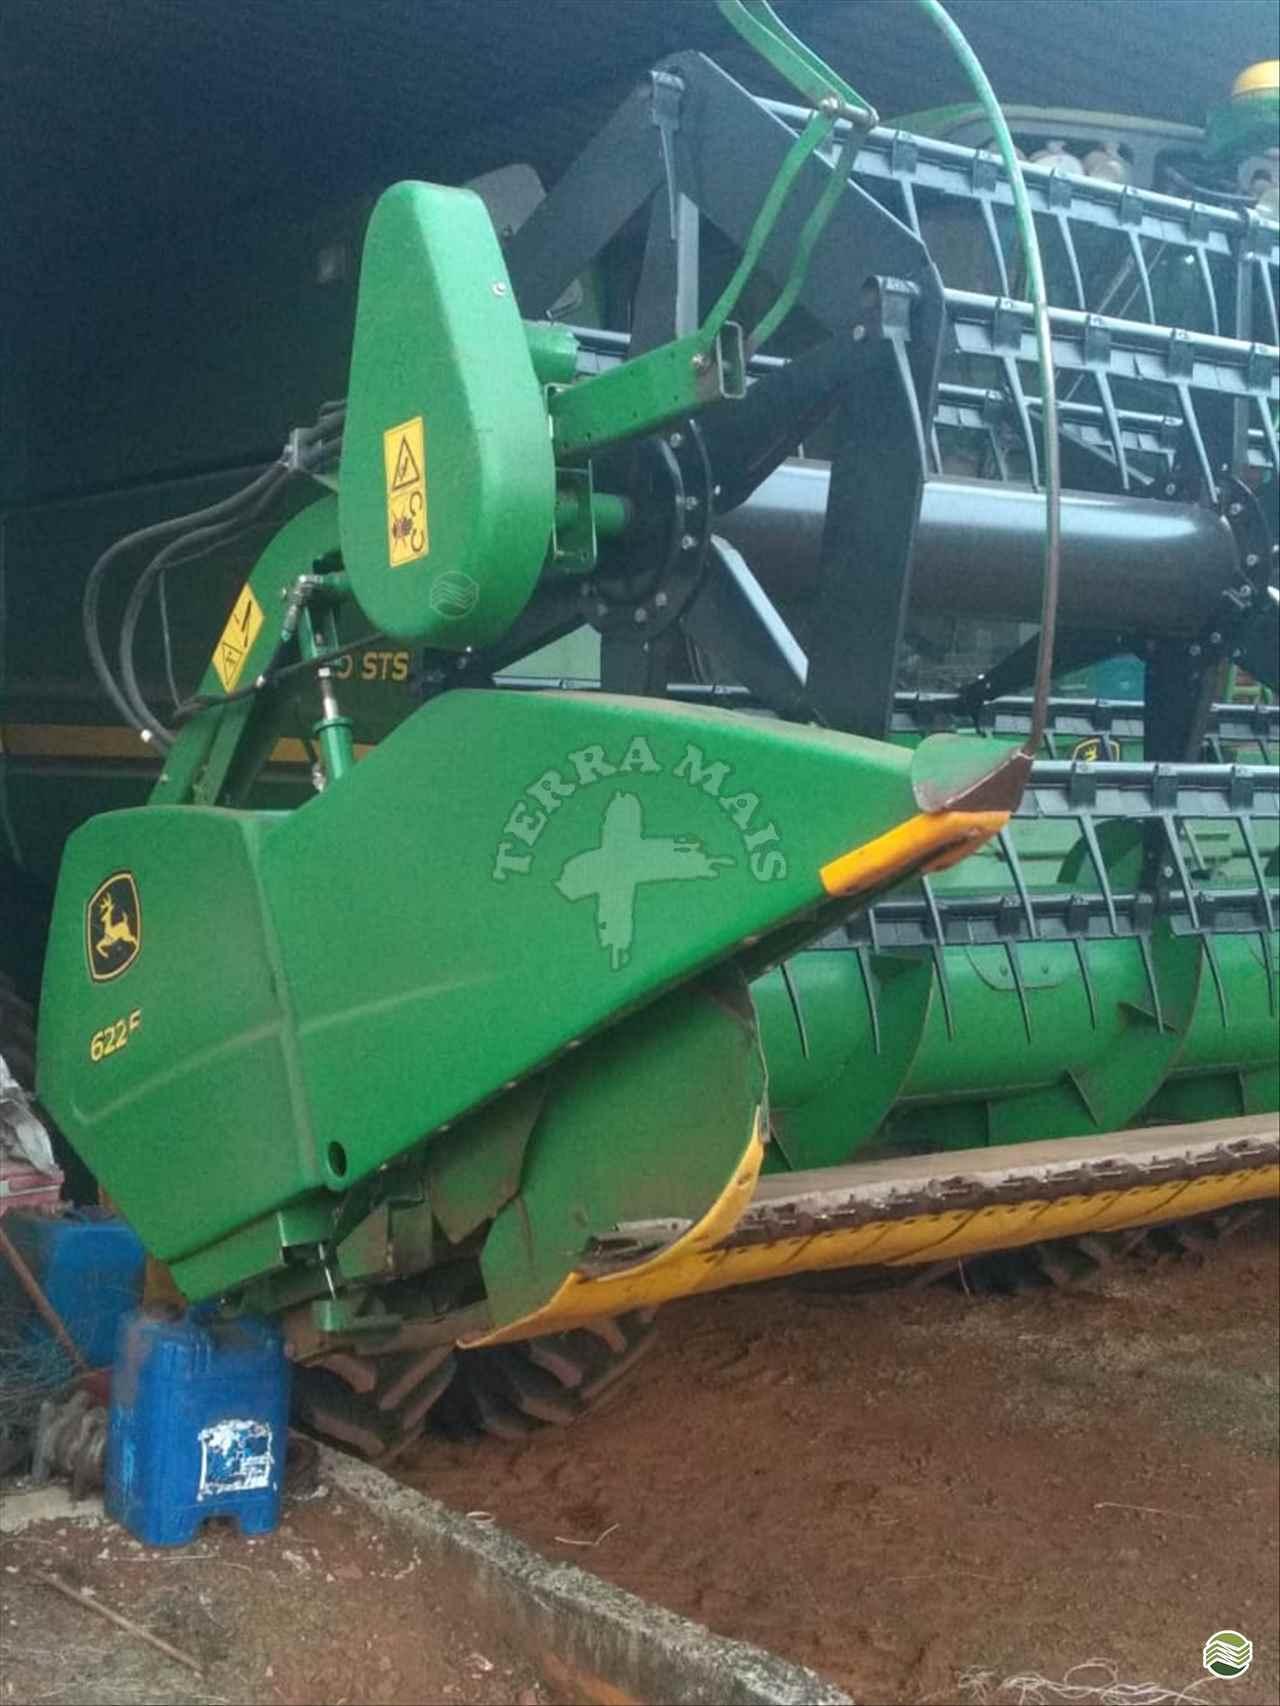 PLATAFORMA COLHEITADEIRA JOHN DEERE JOHN DEERE 622F Terra Mais Implementos Agrícolas TOLEDO PARANÁ PR